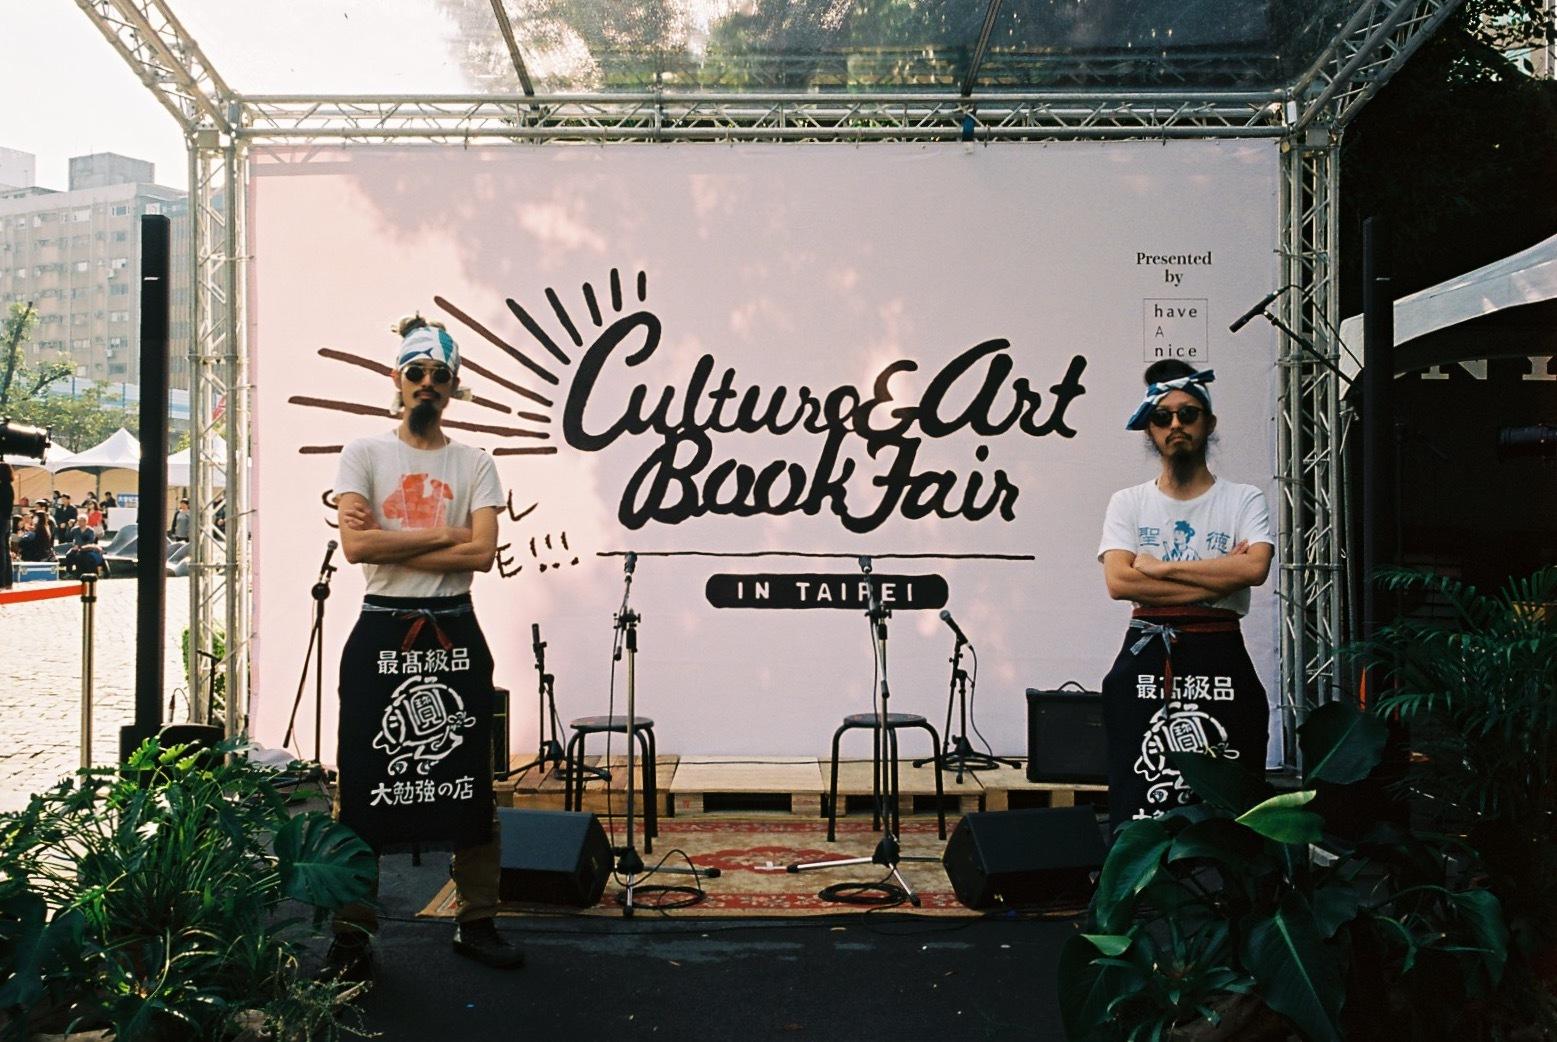 第二回 Culture & Art Book Fair in Taipei2_c0195272_22383447.jpg